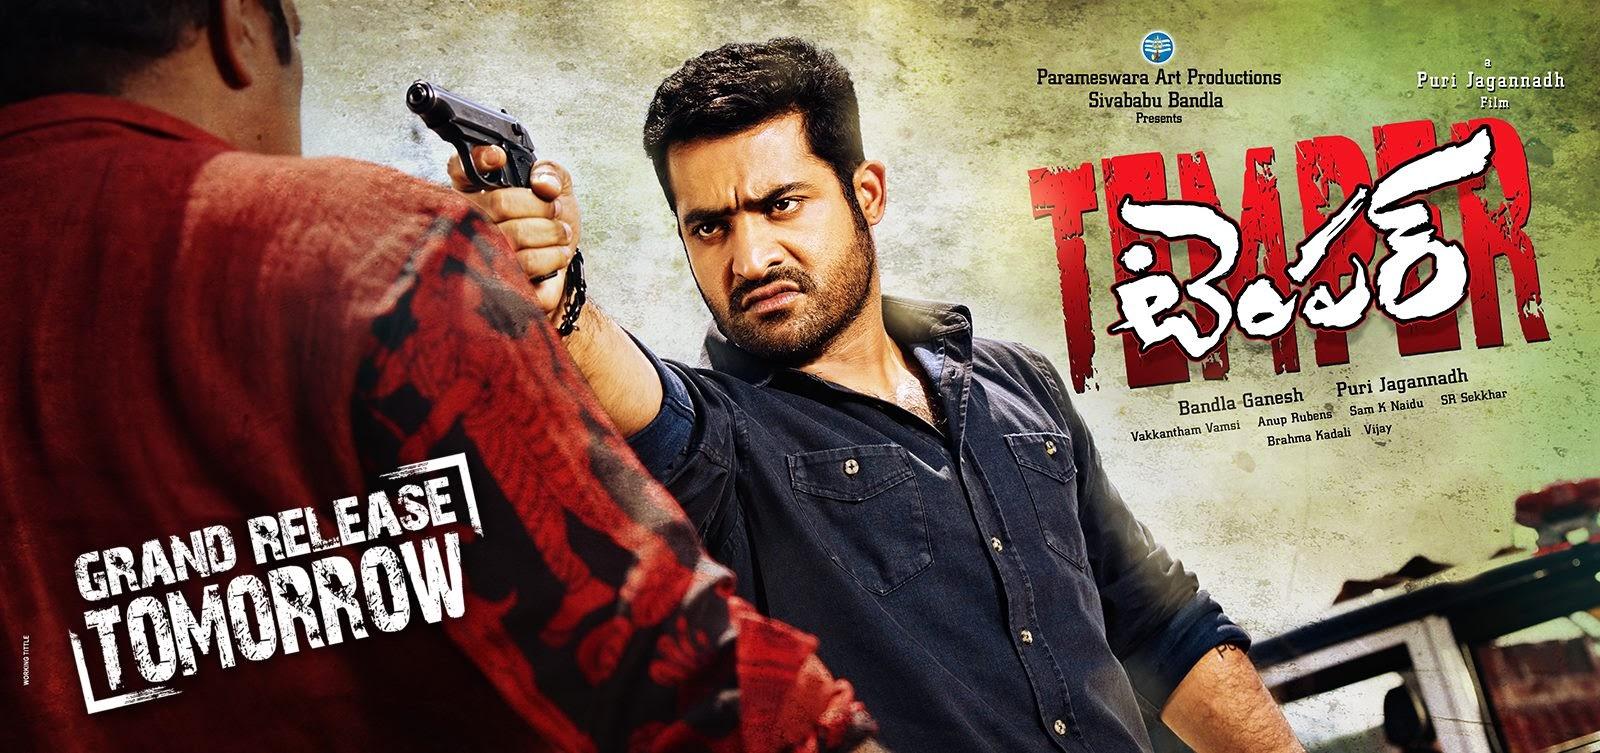 Jr Ntr - Puri Jagannath's Temper Telugu Movie Release Posters